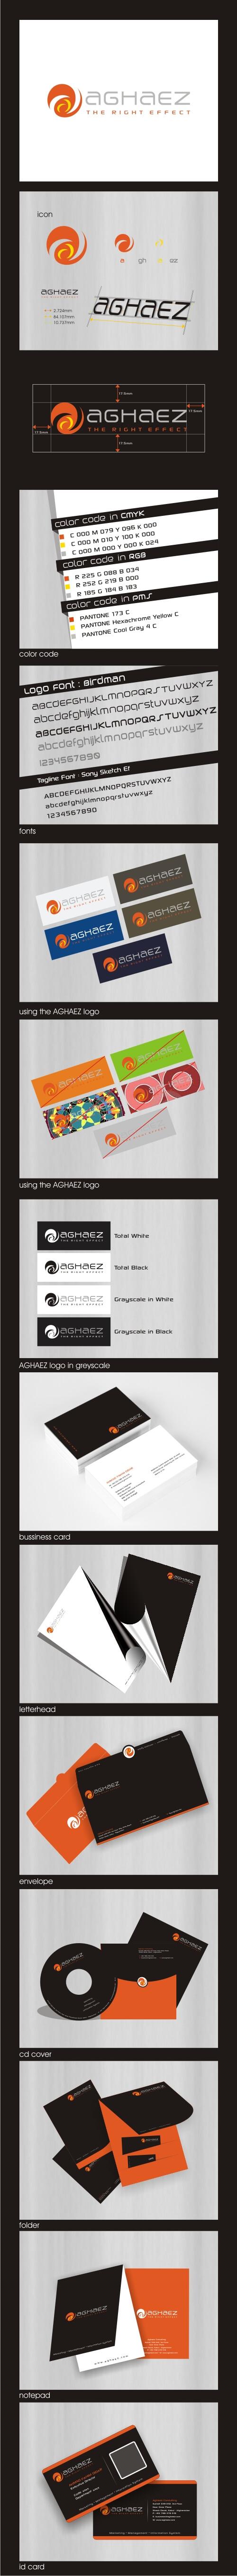 Logo and Corporate Branding